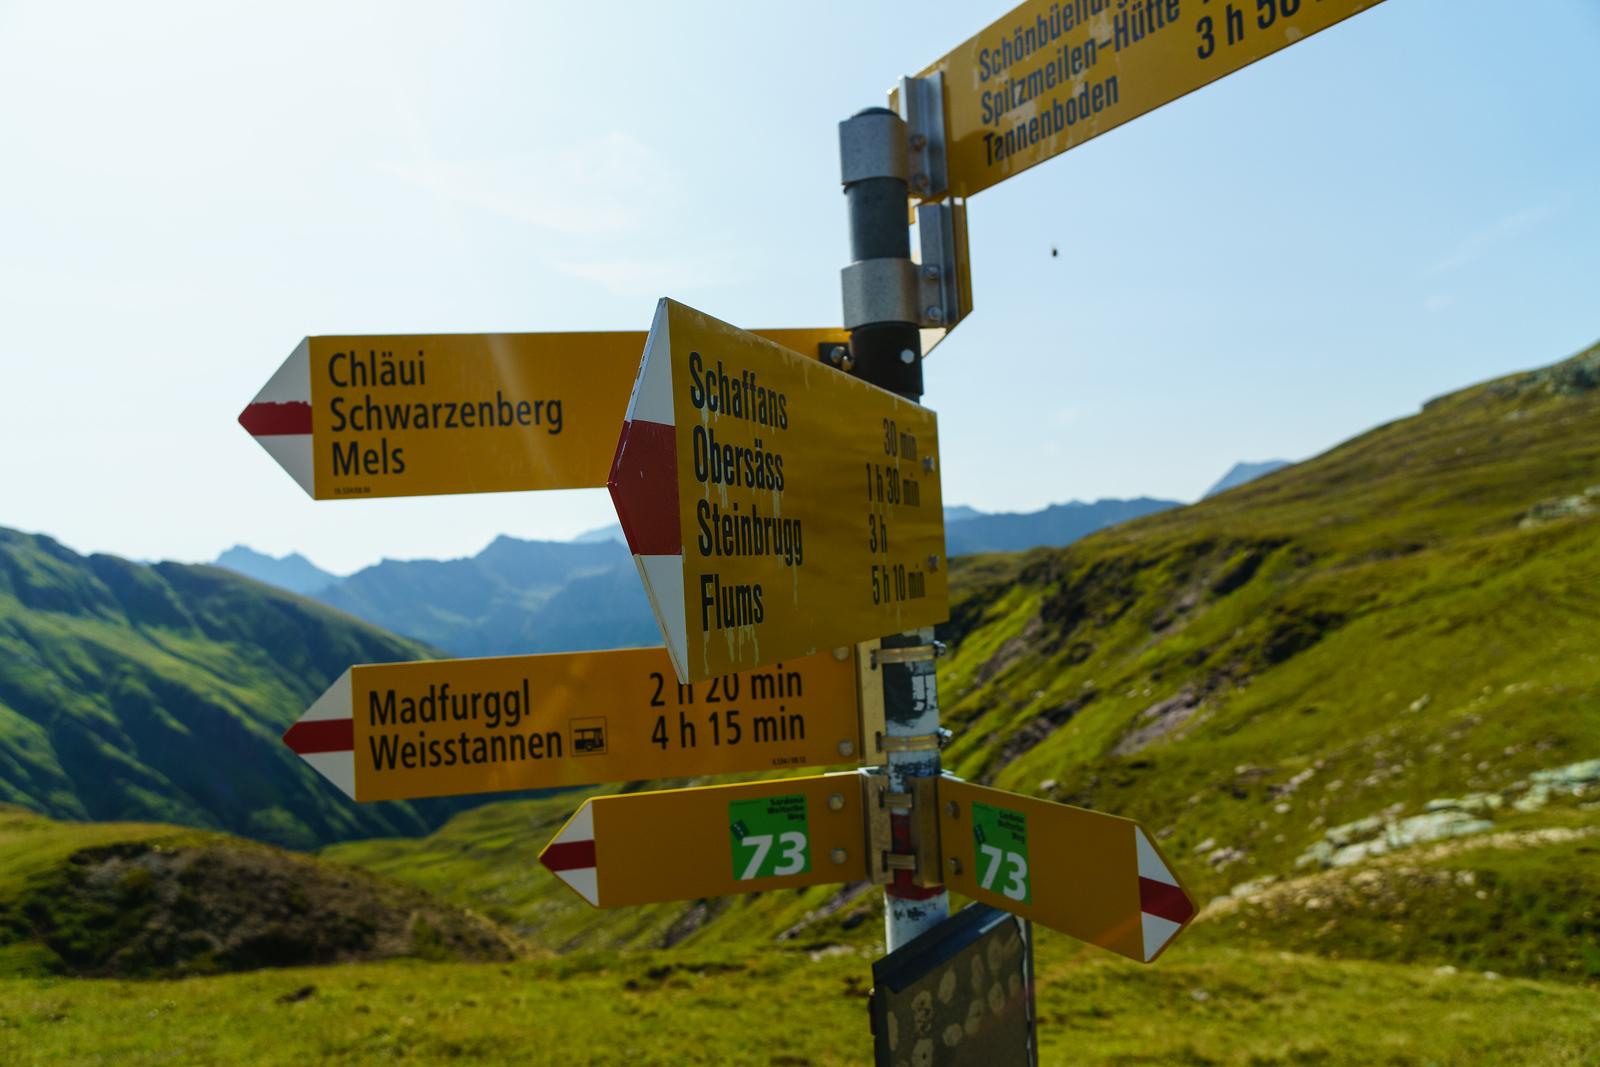 A trail sign in the Glarus region of Switzerland.